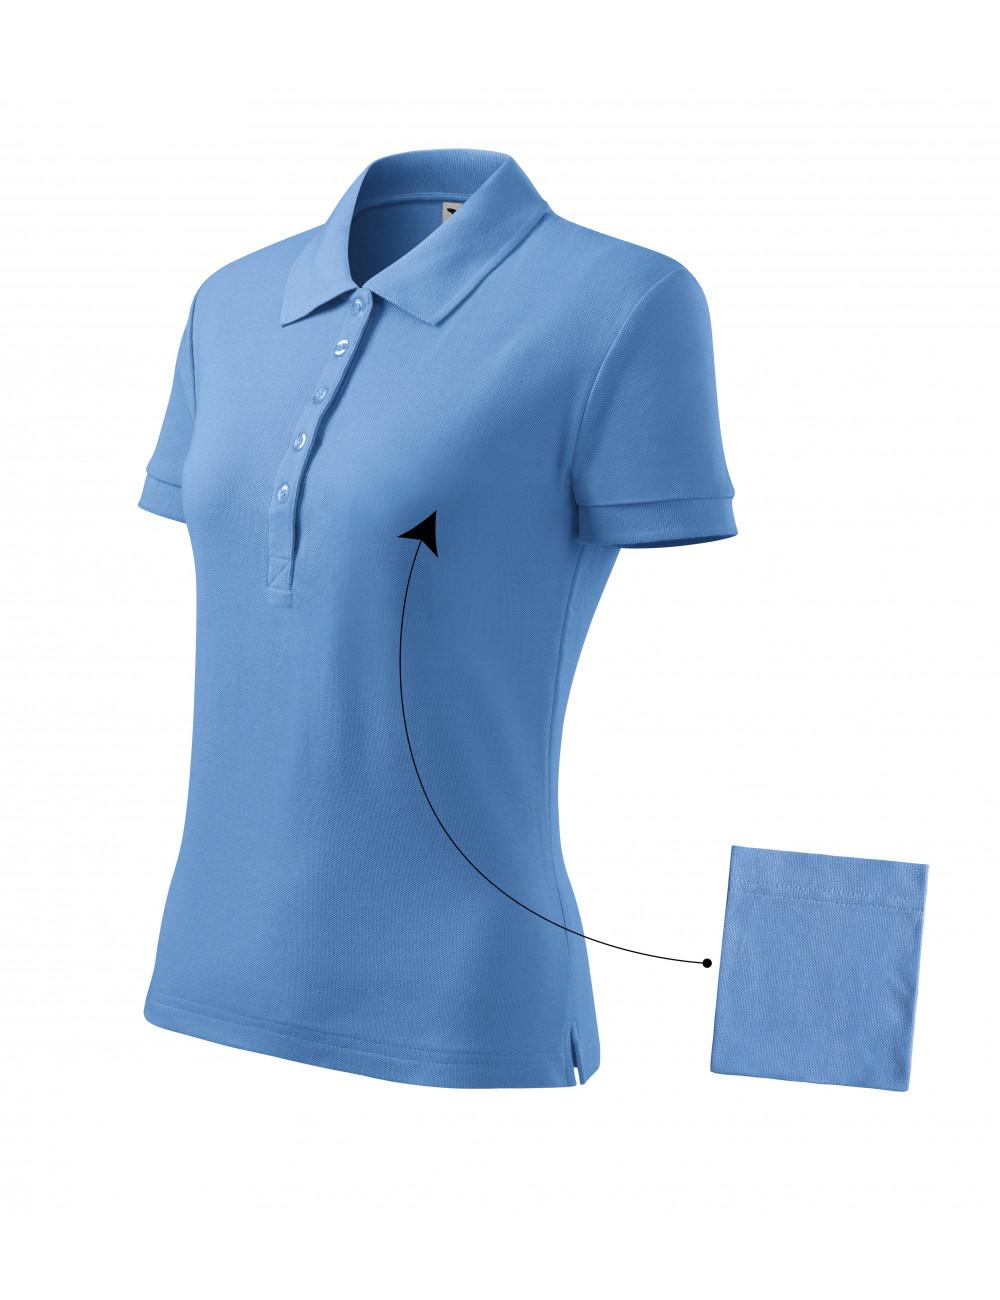 Adler MALFINI Koszulka polo damska Cotton 213 błękitny